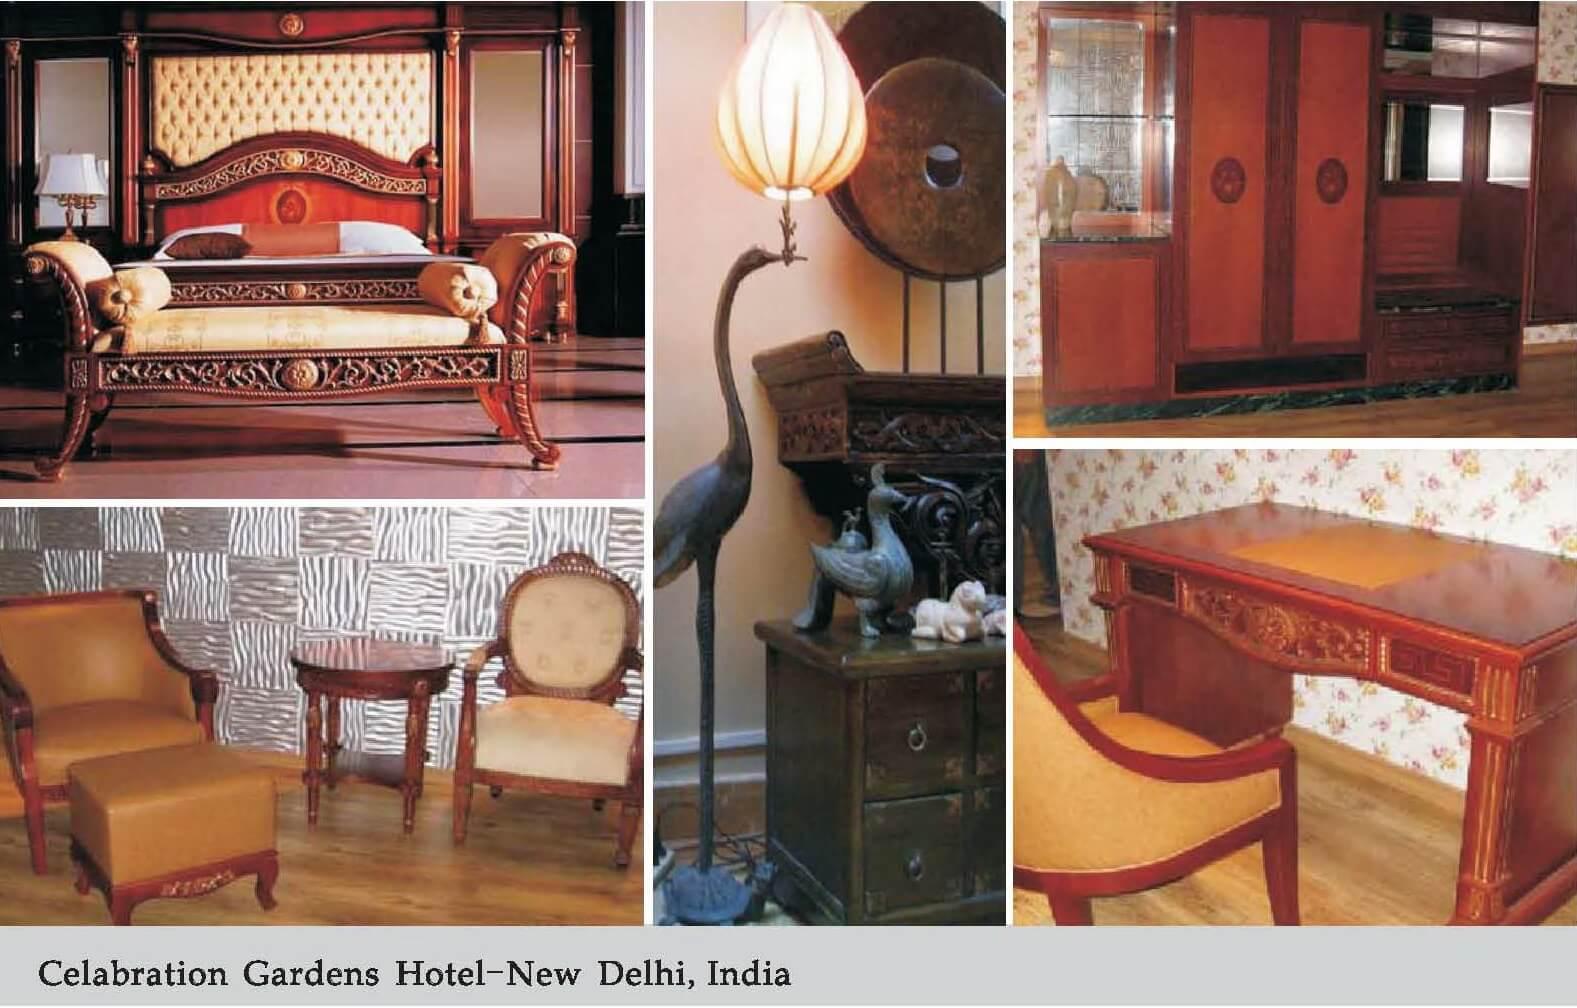 Celabration-Gardens-Hotel-New-Delhi-India